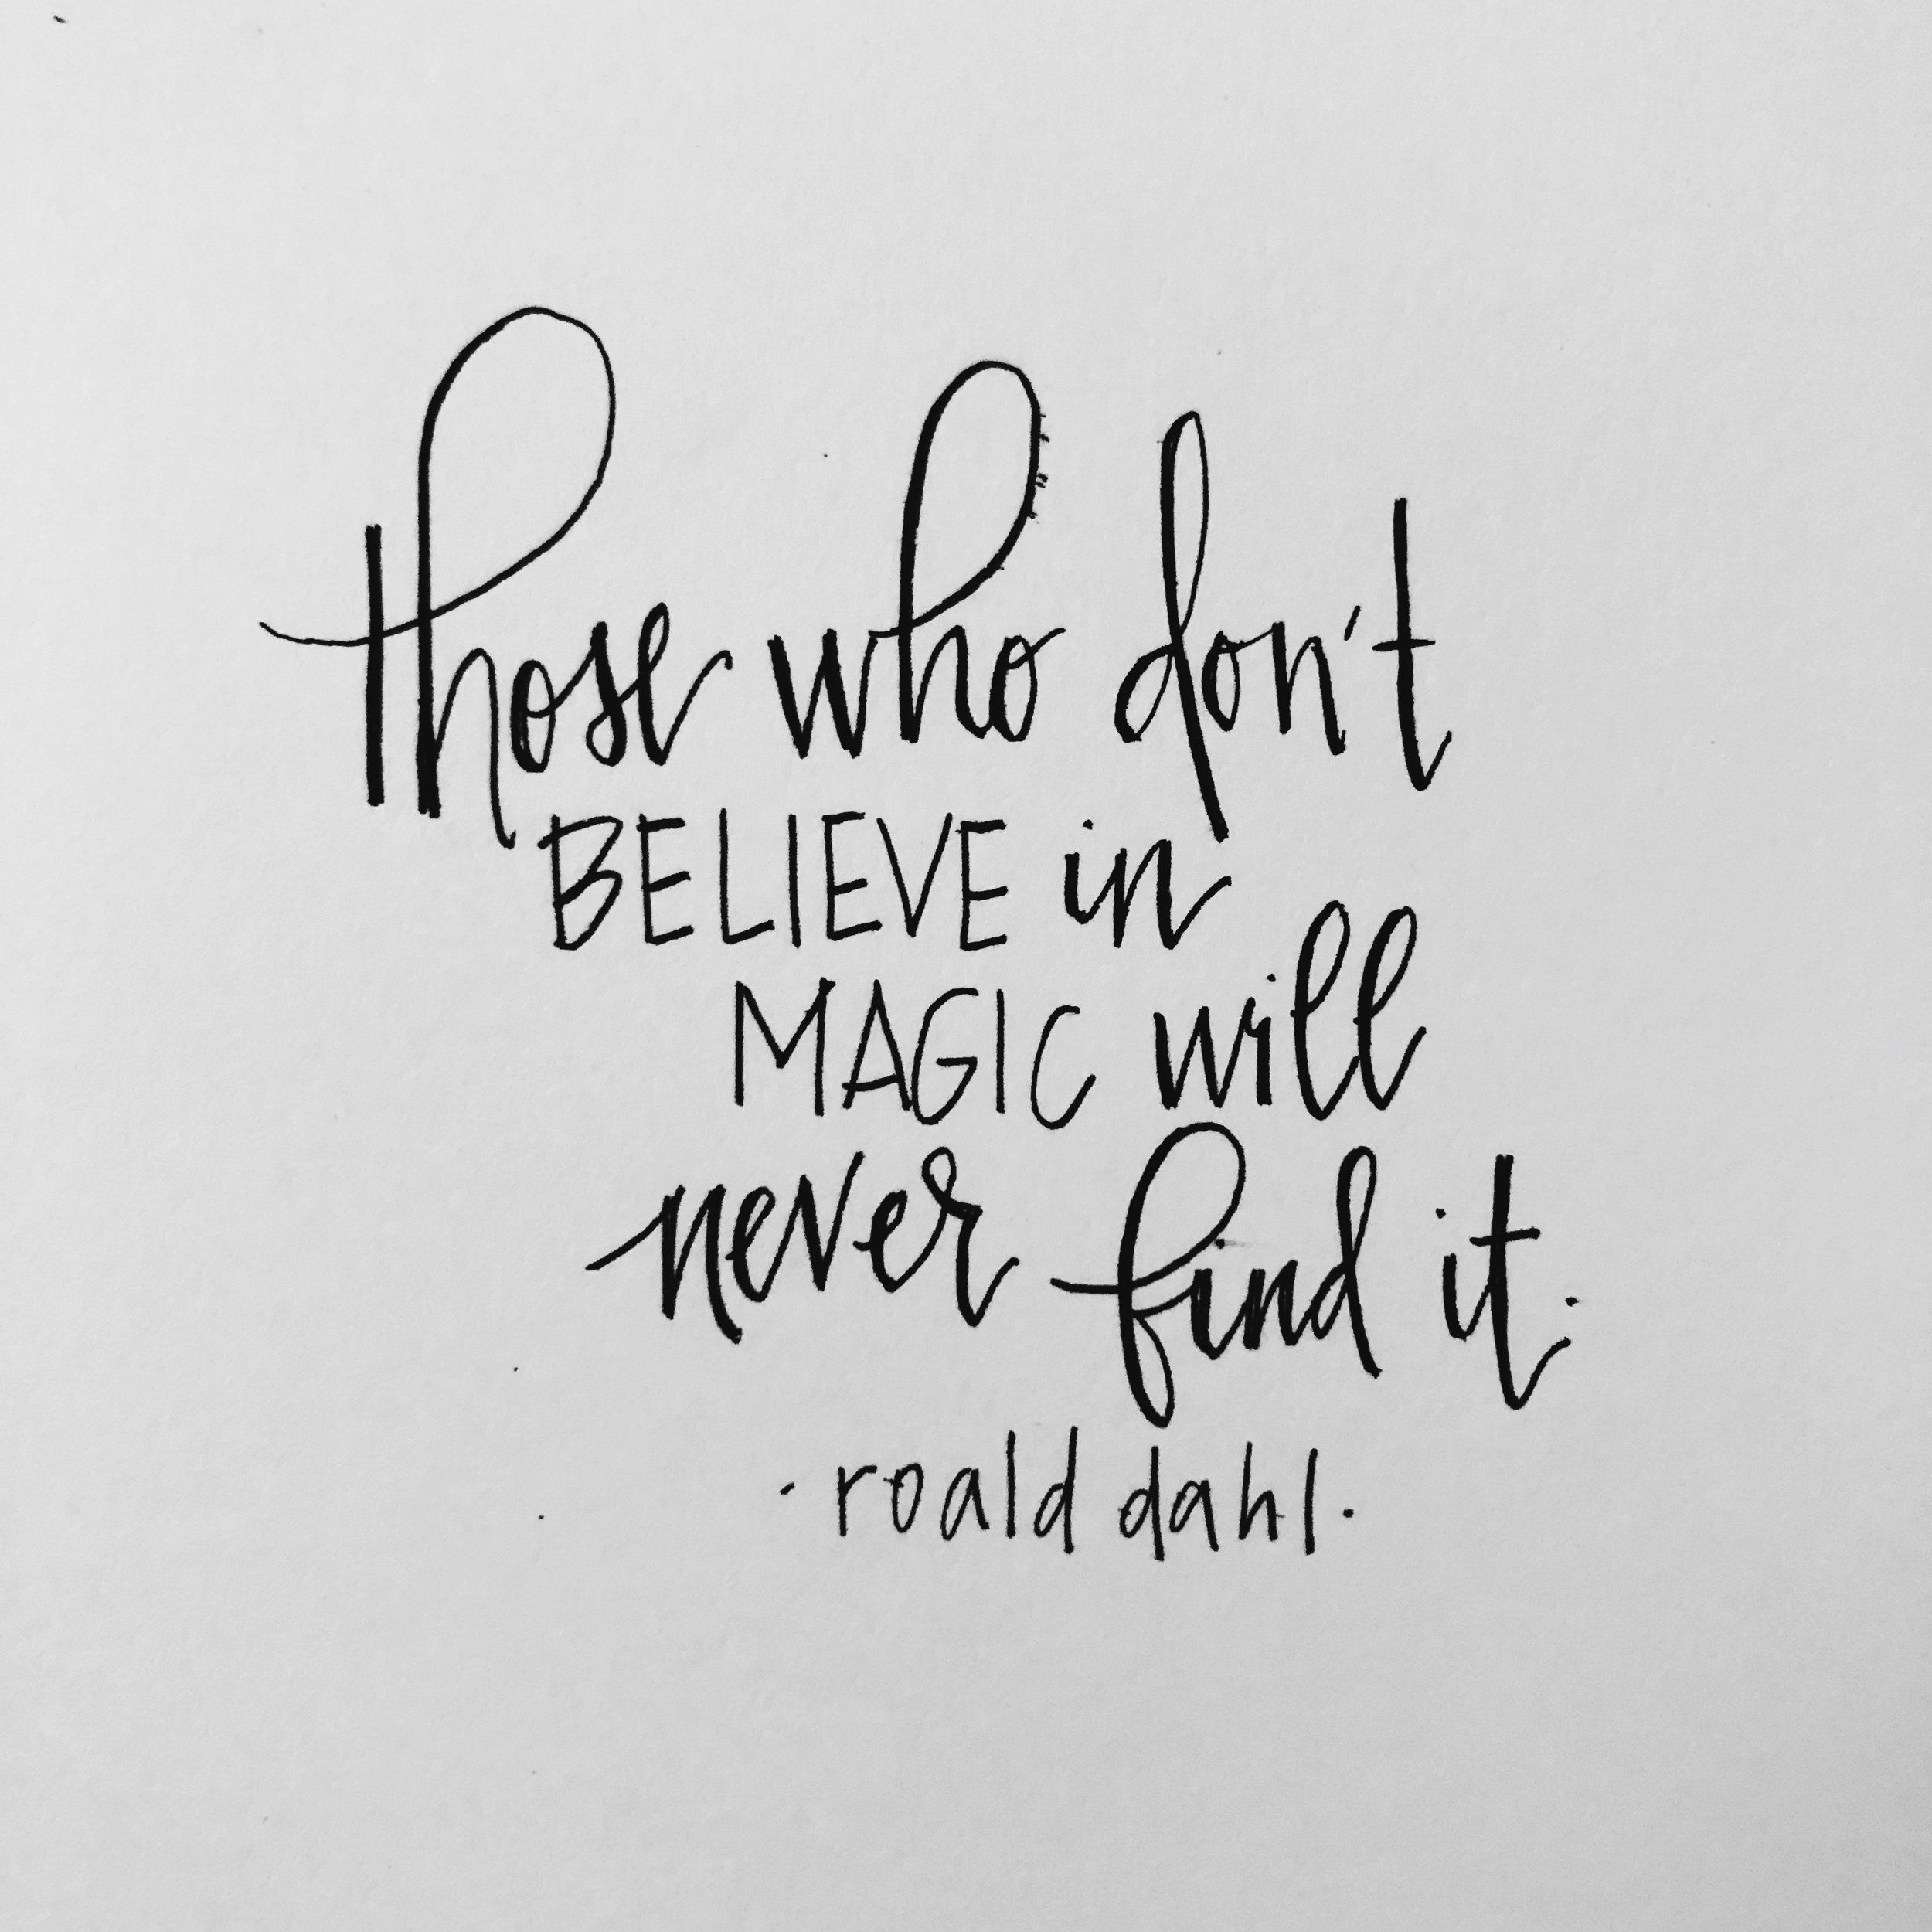 Find magic. — Kristen DeLap